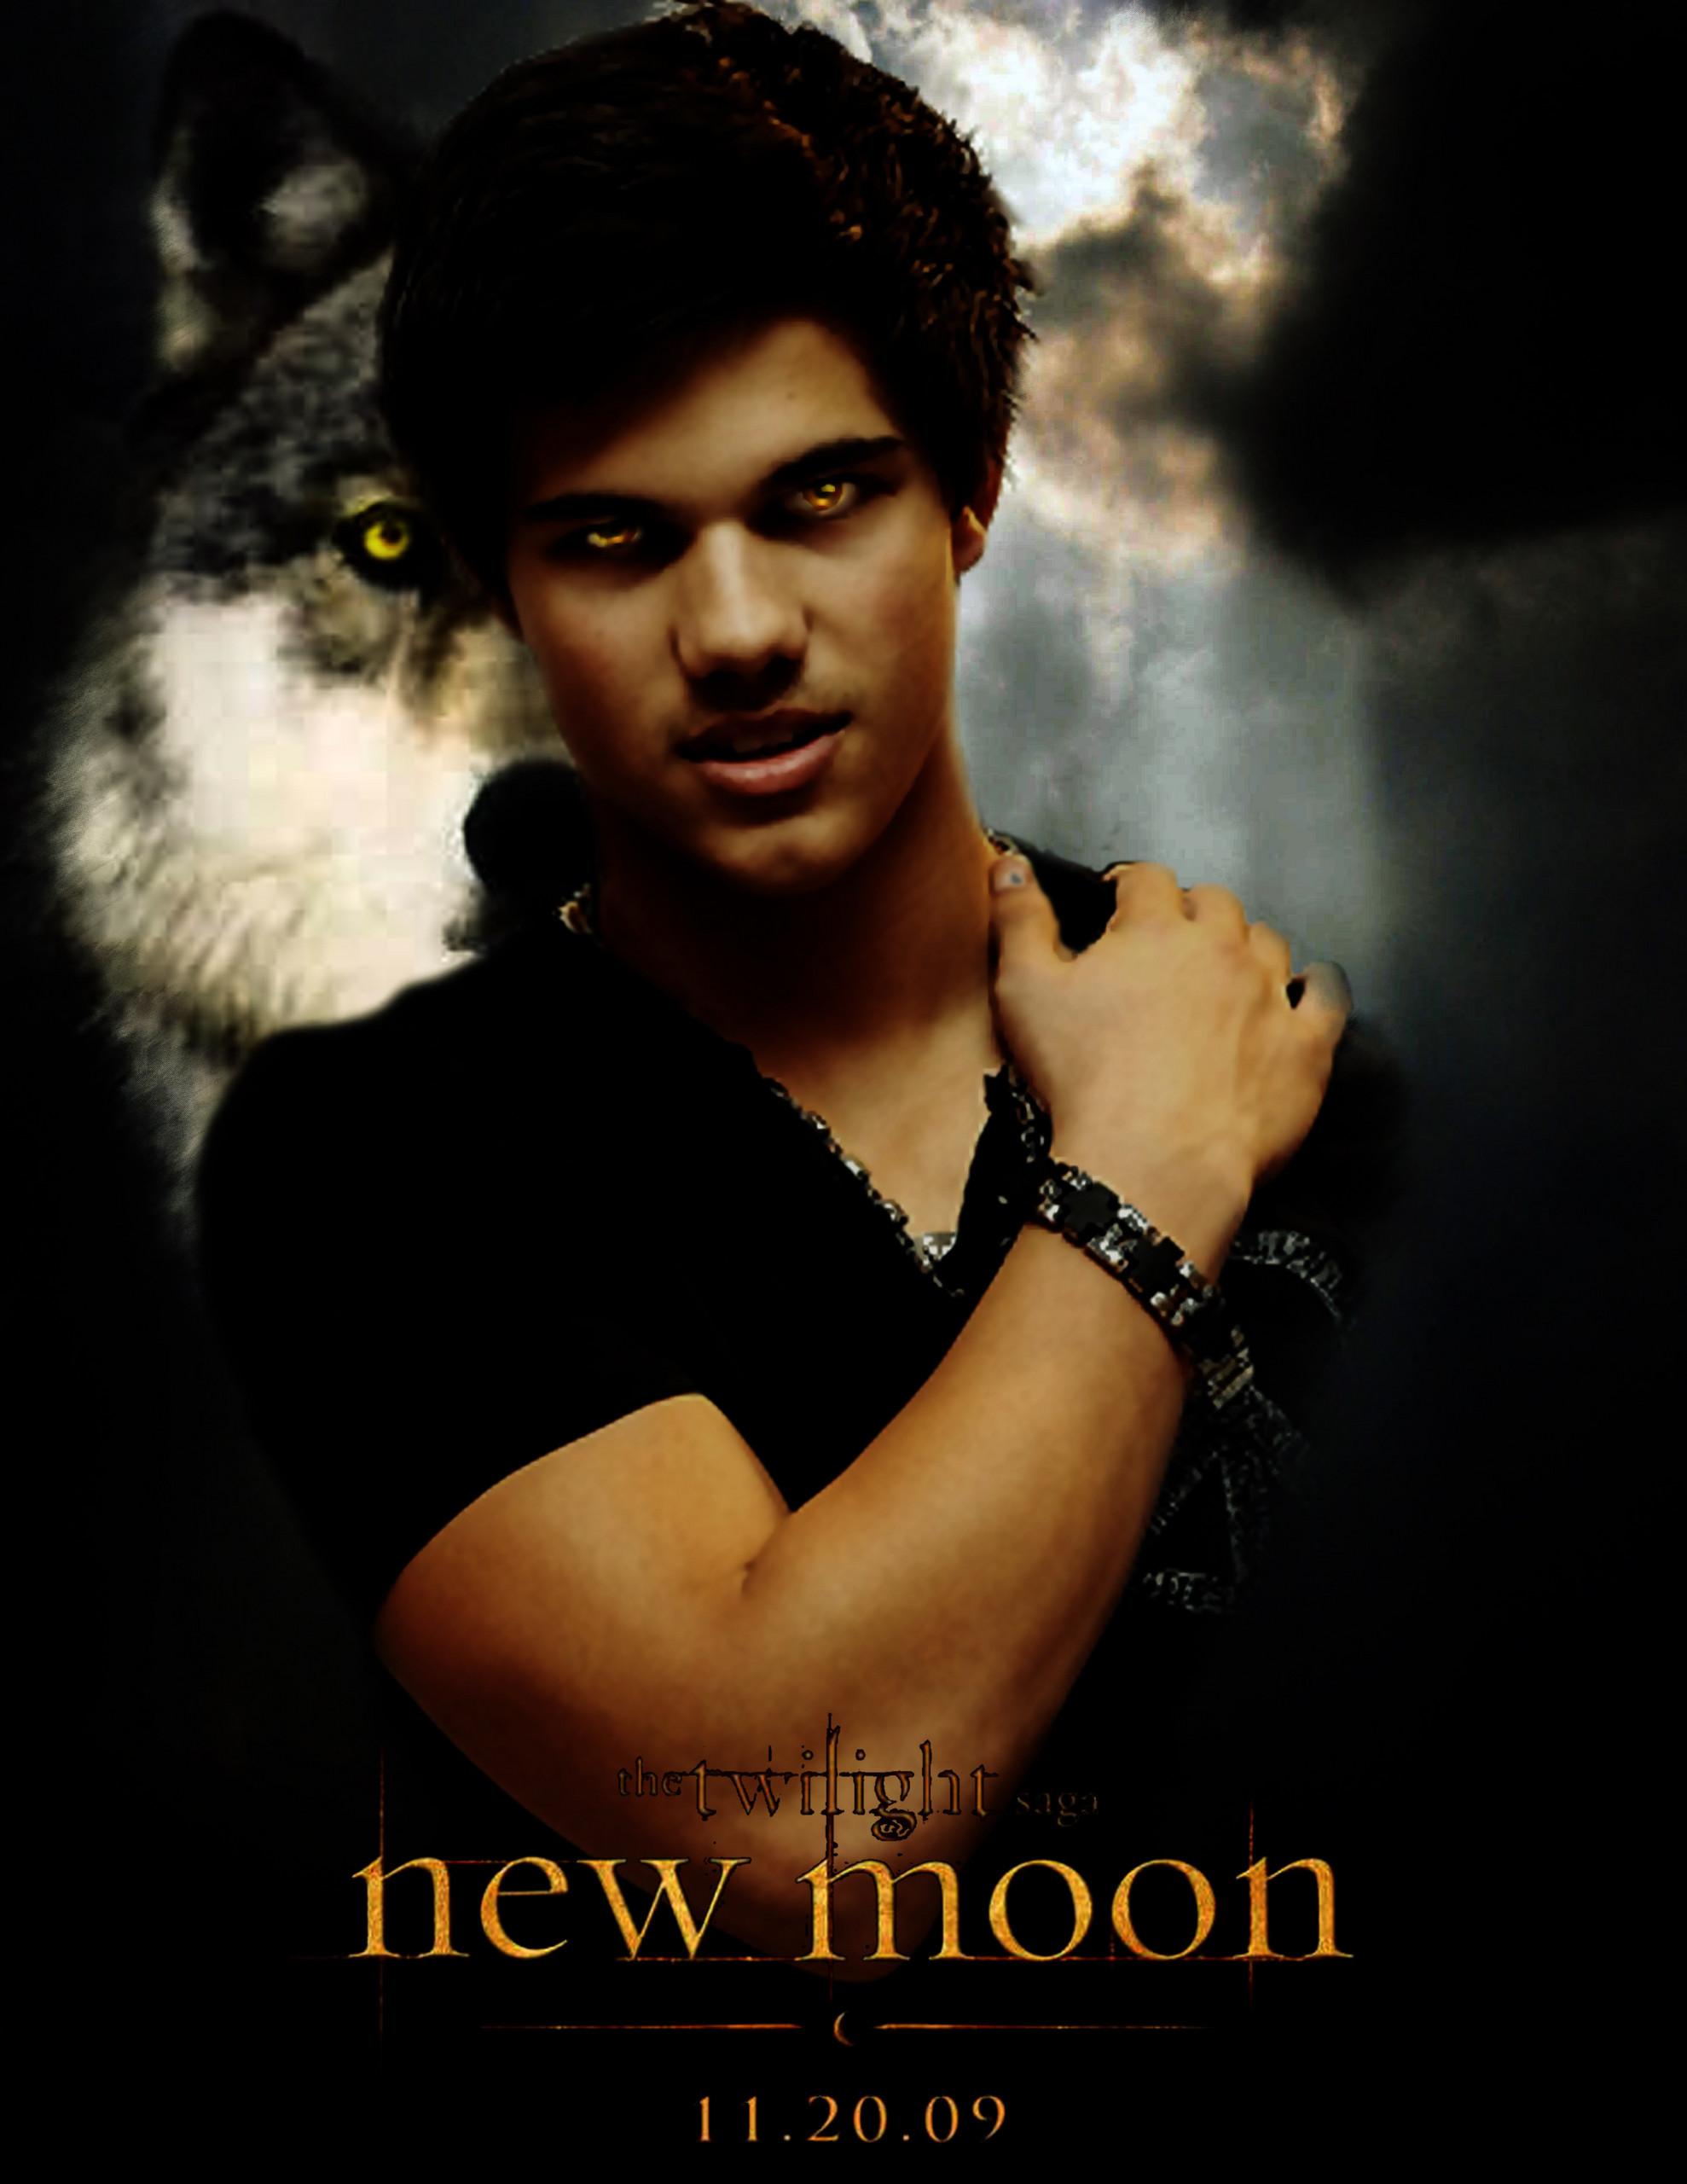 Jacob New Moon! – New Moon Photo (5921410) – Fanpop